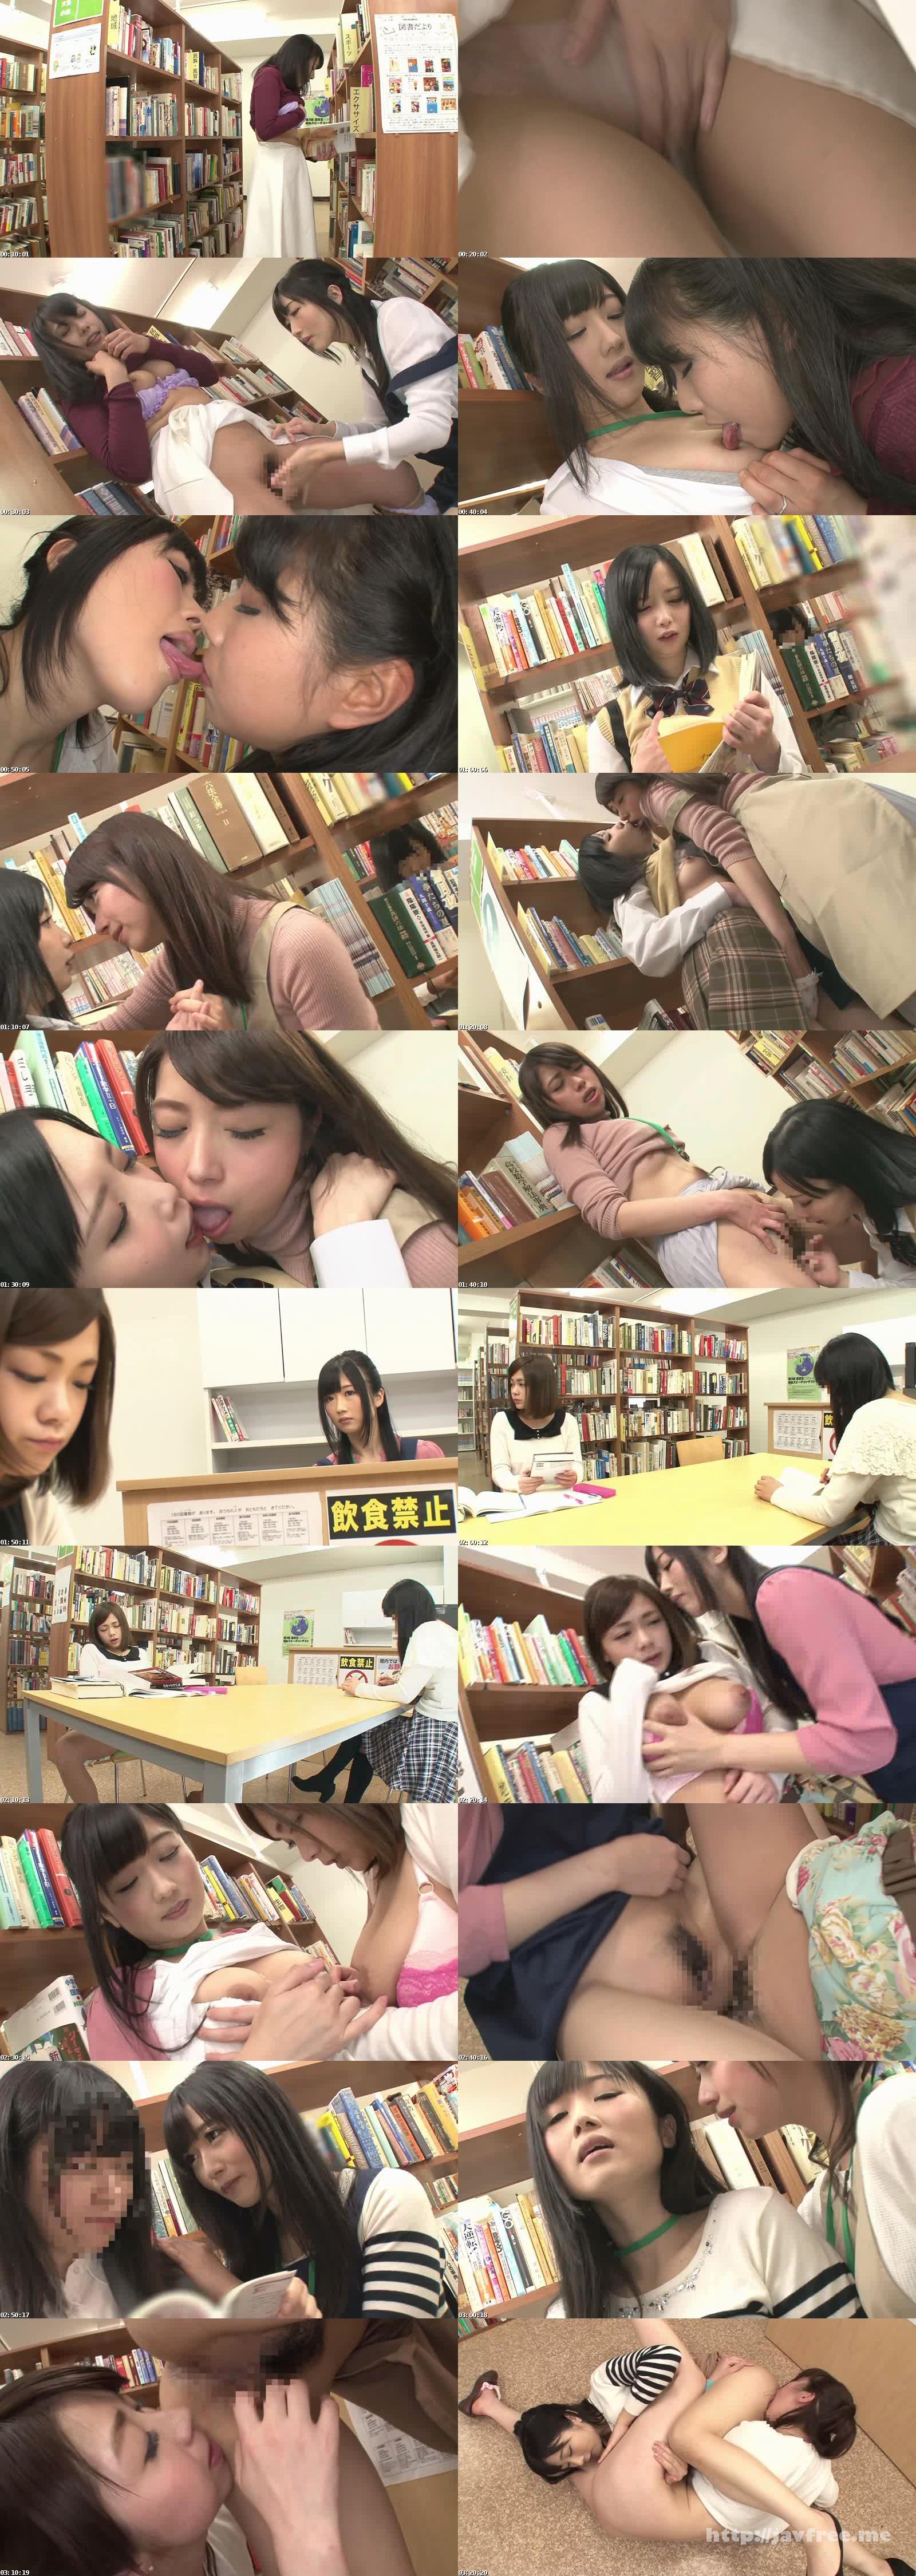 [HUNTA 017] 司書の私(レズビアン)が勤める図書館には時々、恥ずかしそうにしながらHな書籍(官能小説、How to本、ヌード本など)を探しに女子がやって来る。 4 HUNTA